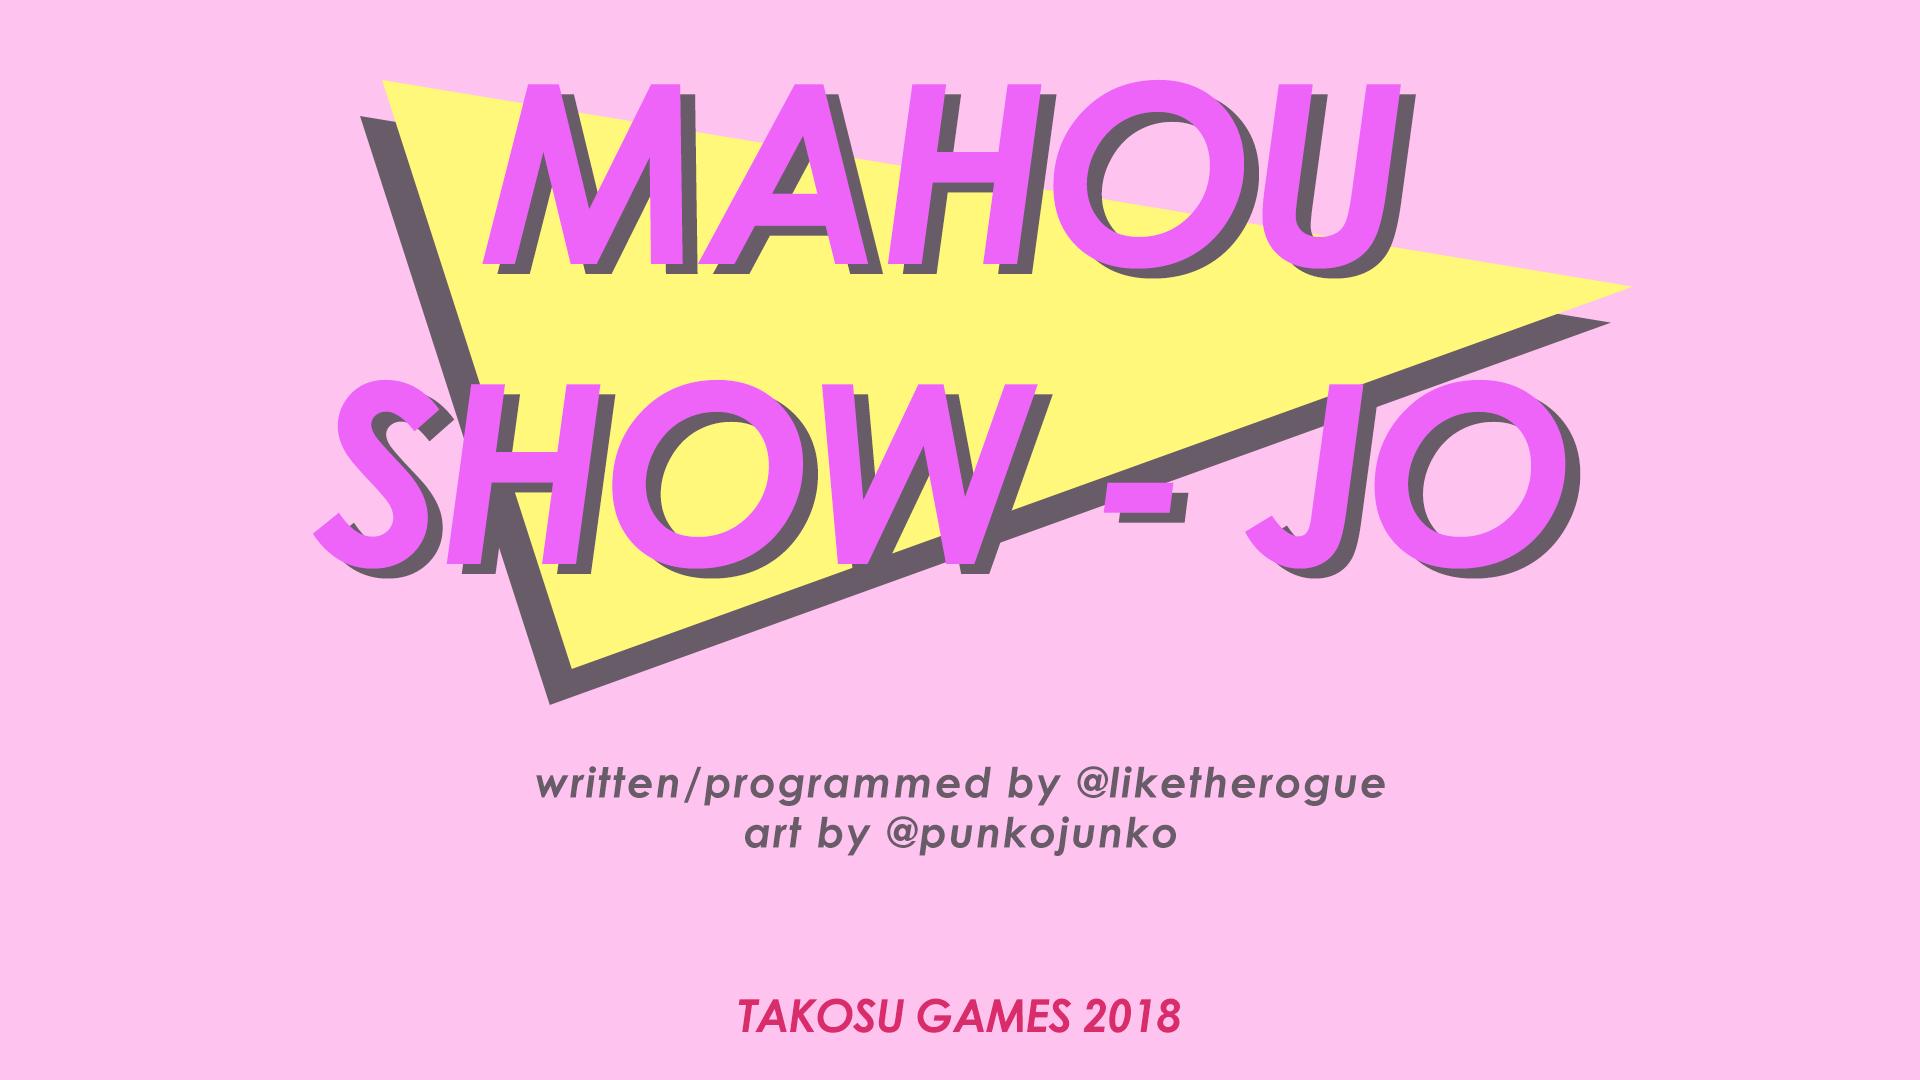 Mahou Show-Jo